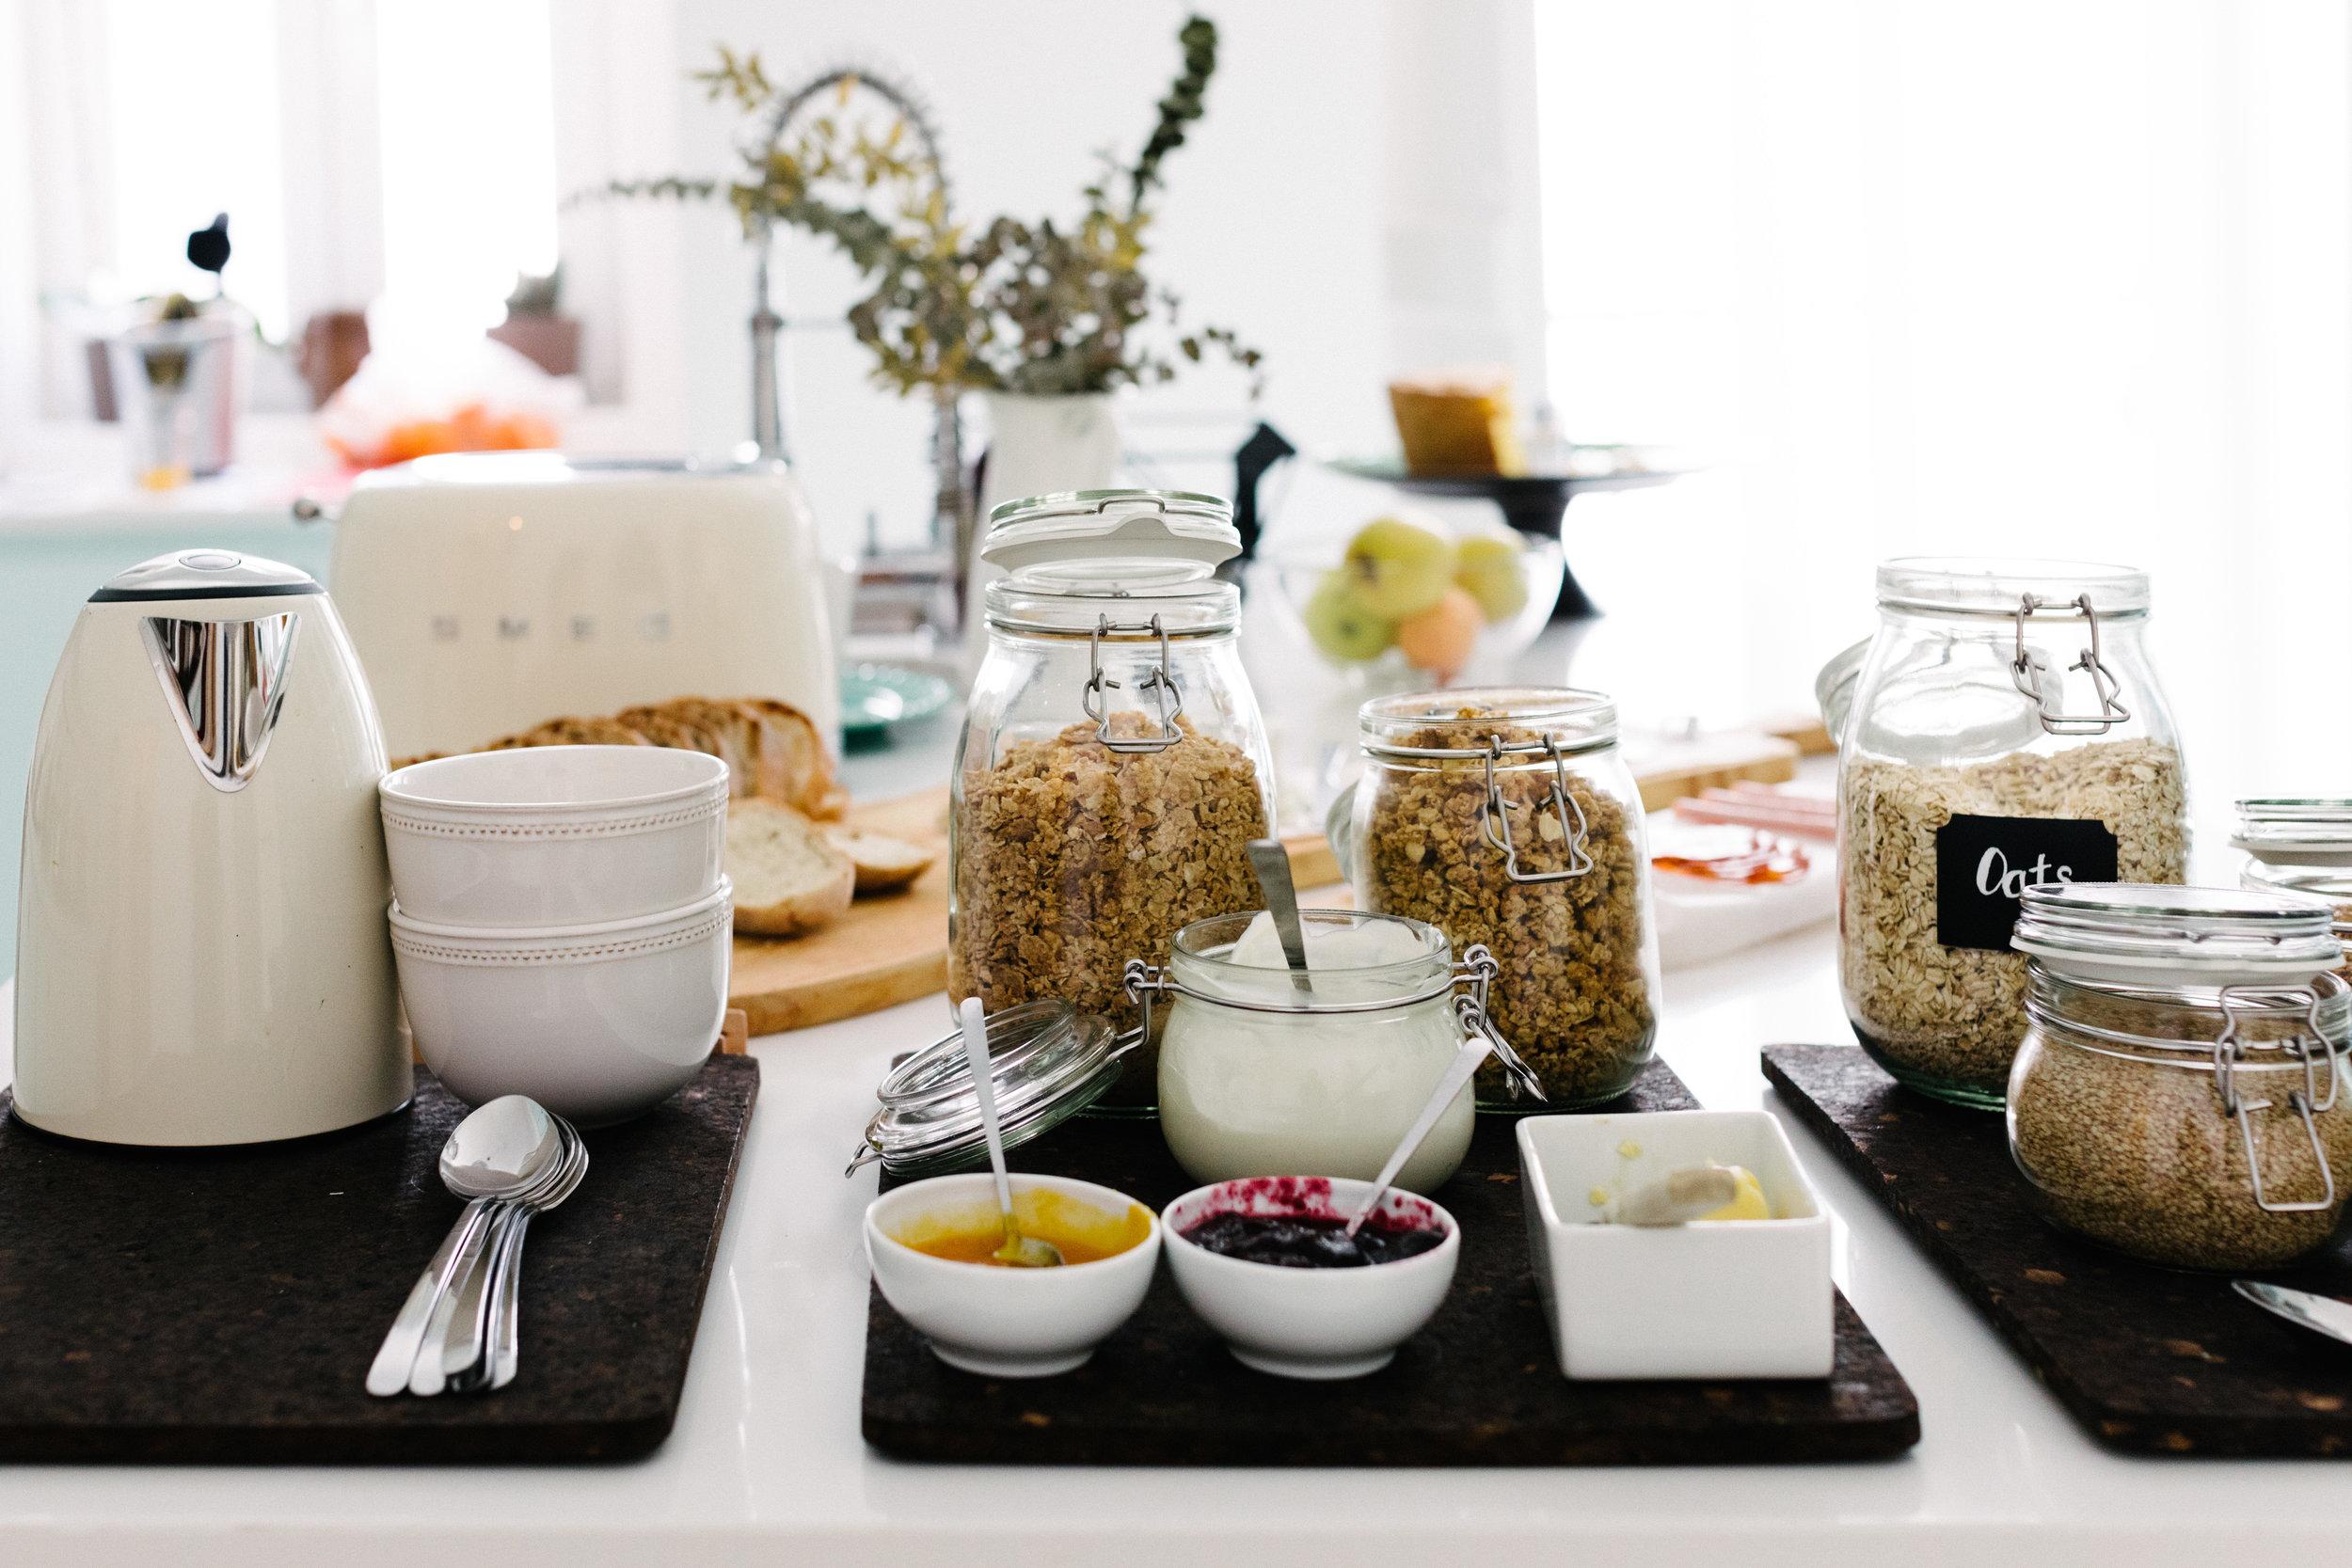 Breakfast at A Casa C'alma